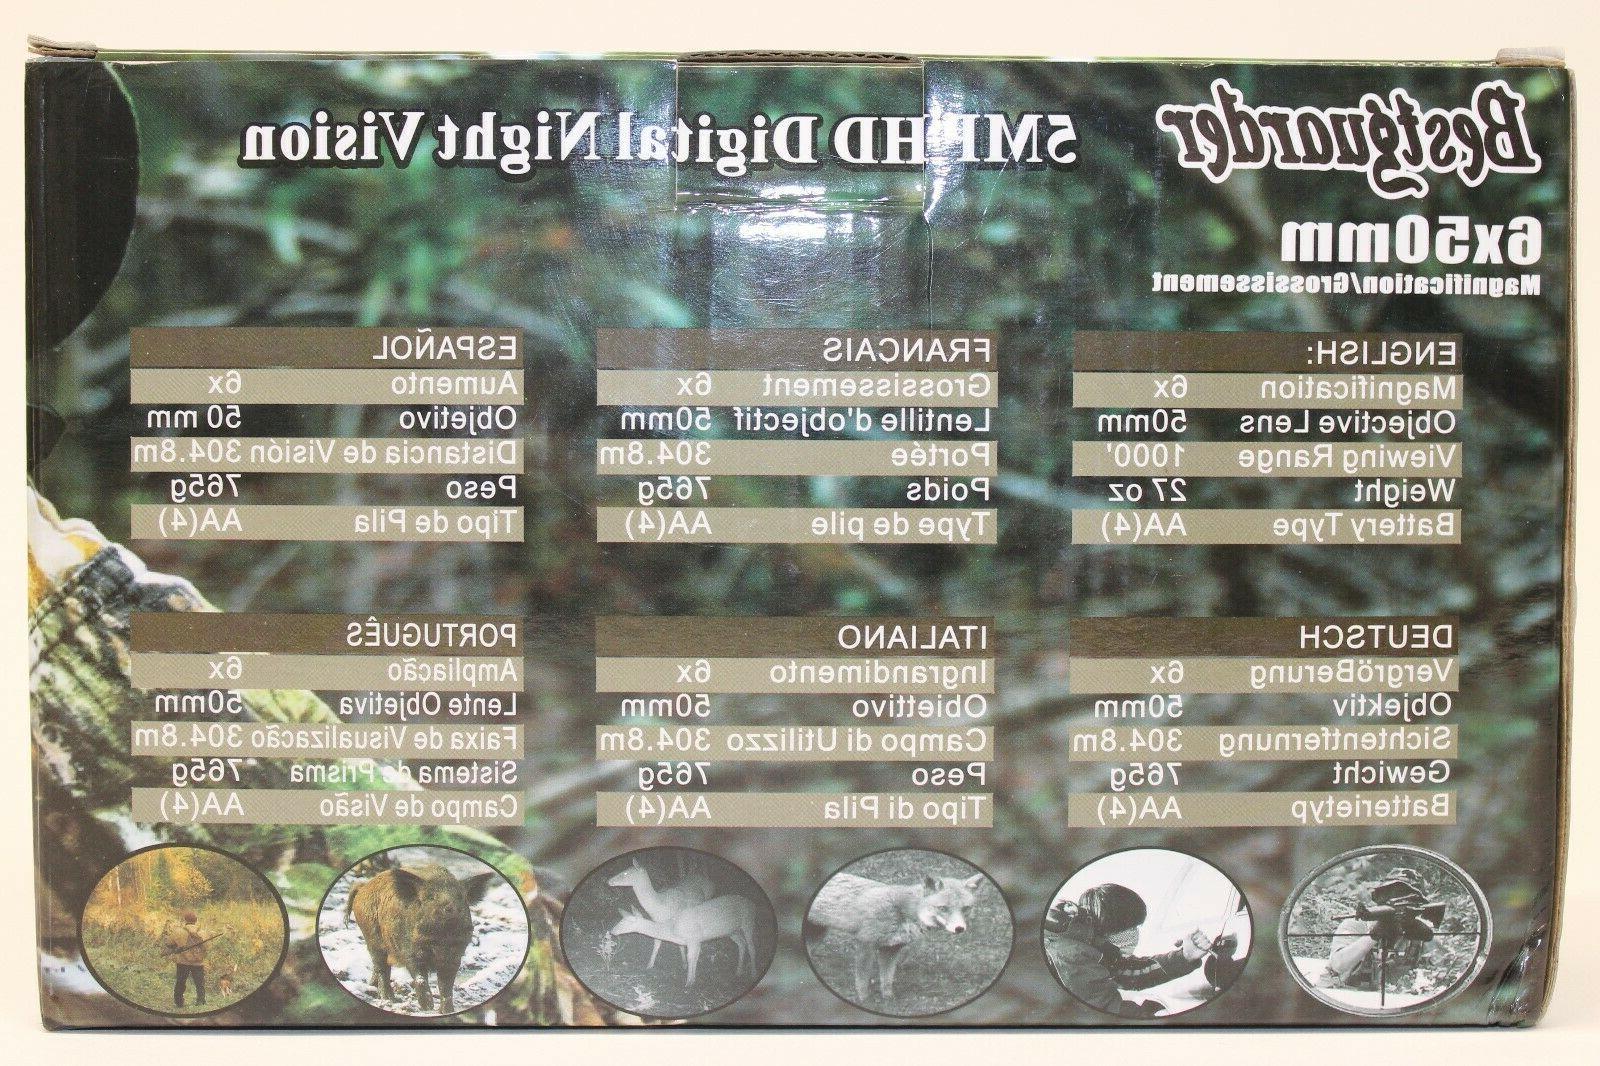 Bestguarder 5MP HD Digital Monocular